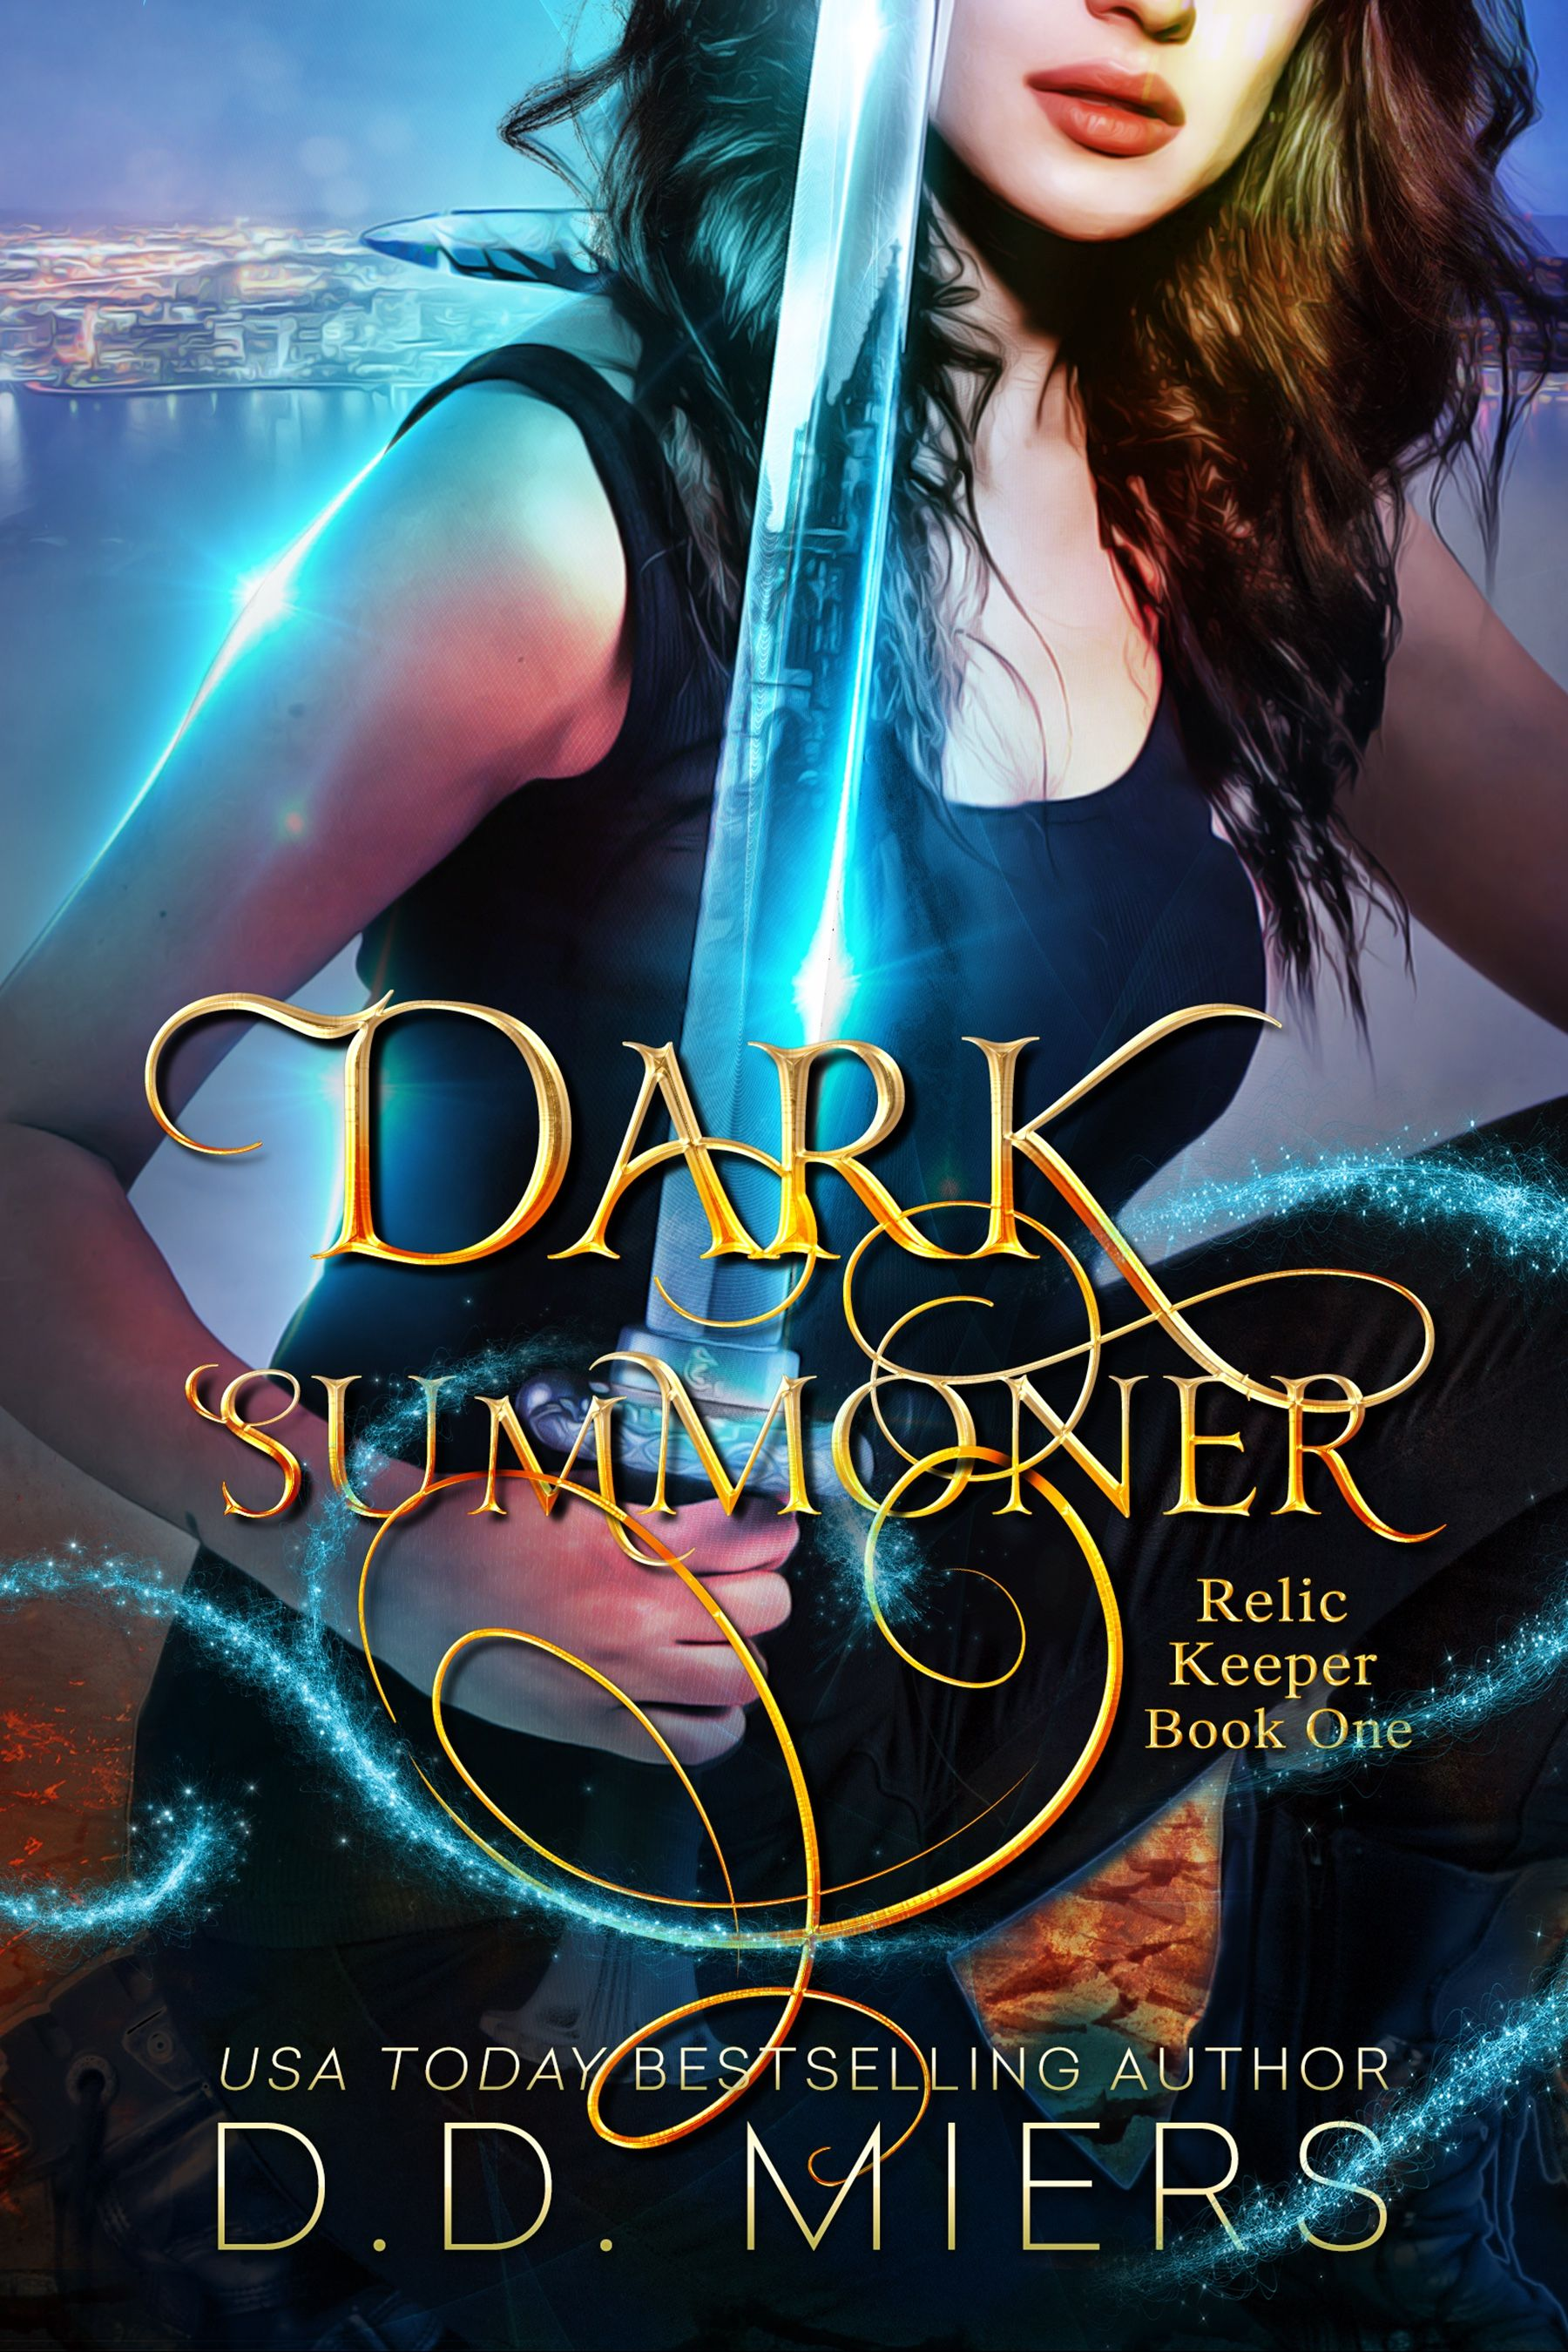 Dark Summoner 2018 Cover #USATodayAuthors #RelicKeeperSeries